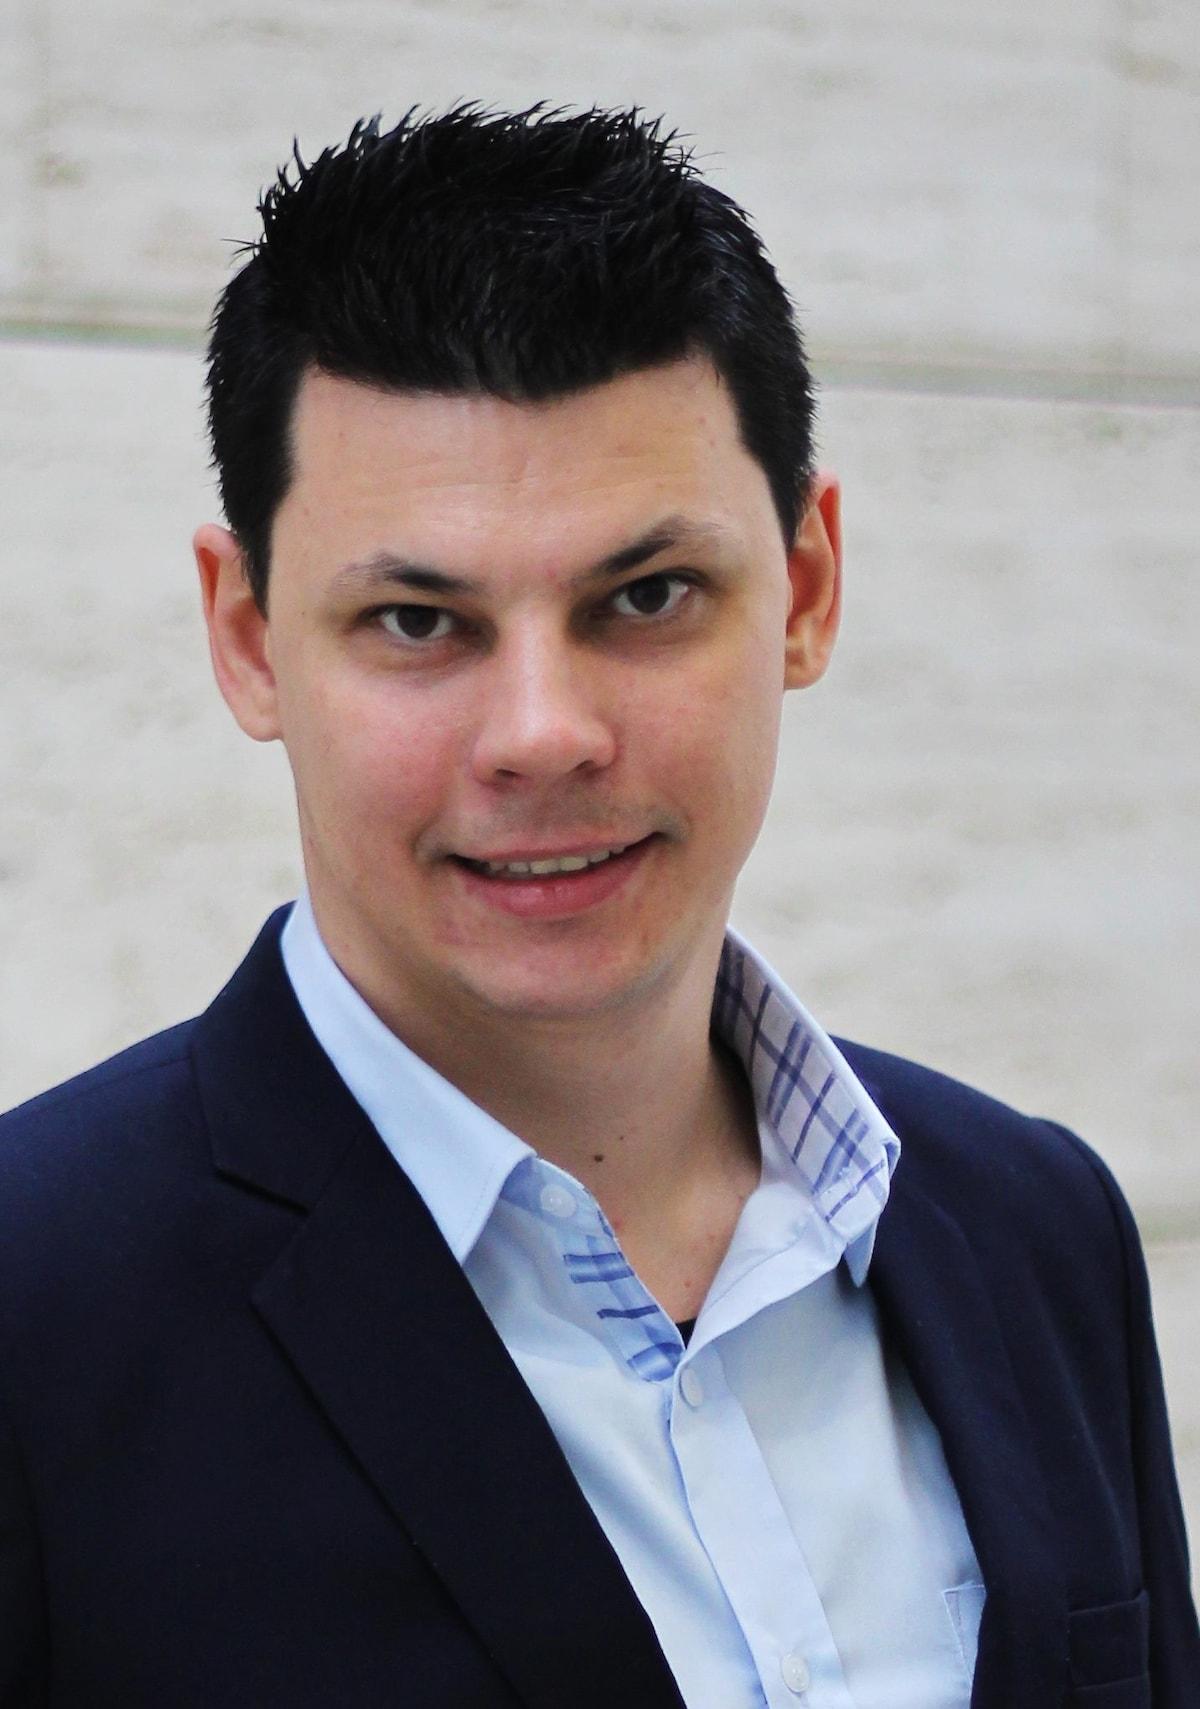 Zsolt From Debrecen, Hungary